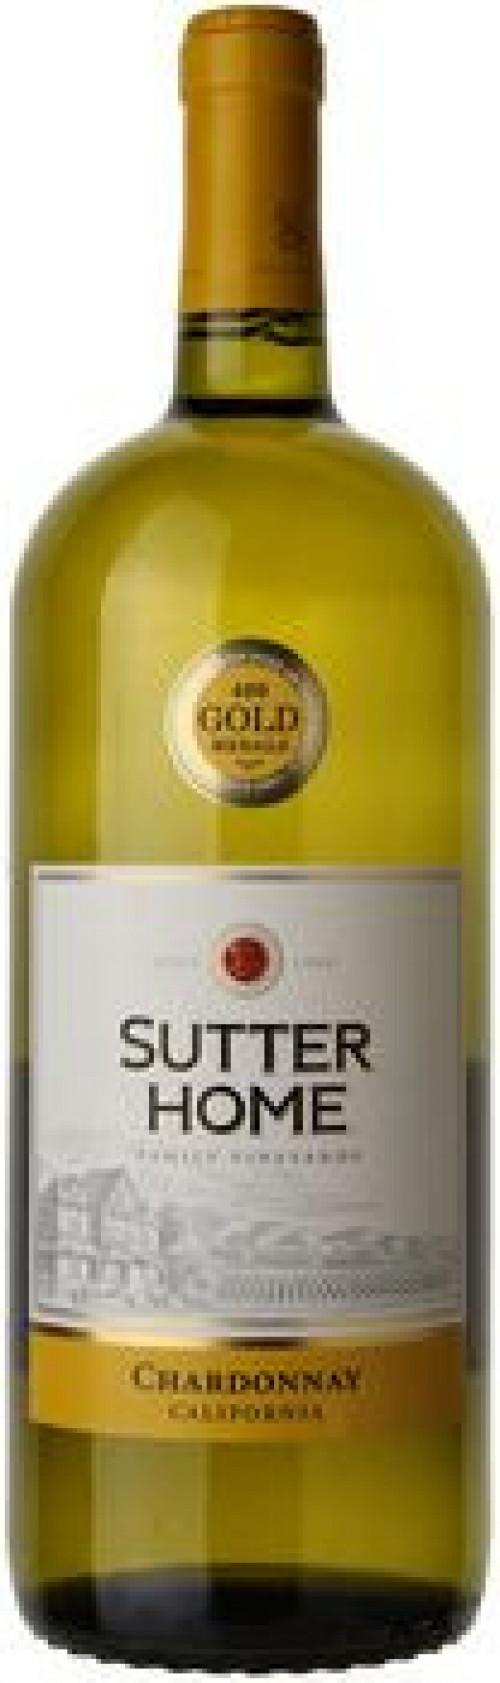 Sutter Home Chardonnay 1.5 Ltr